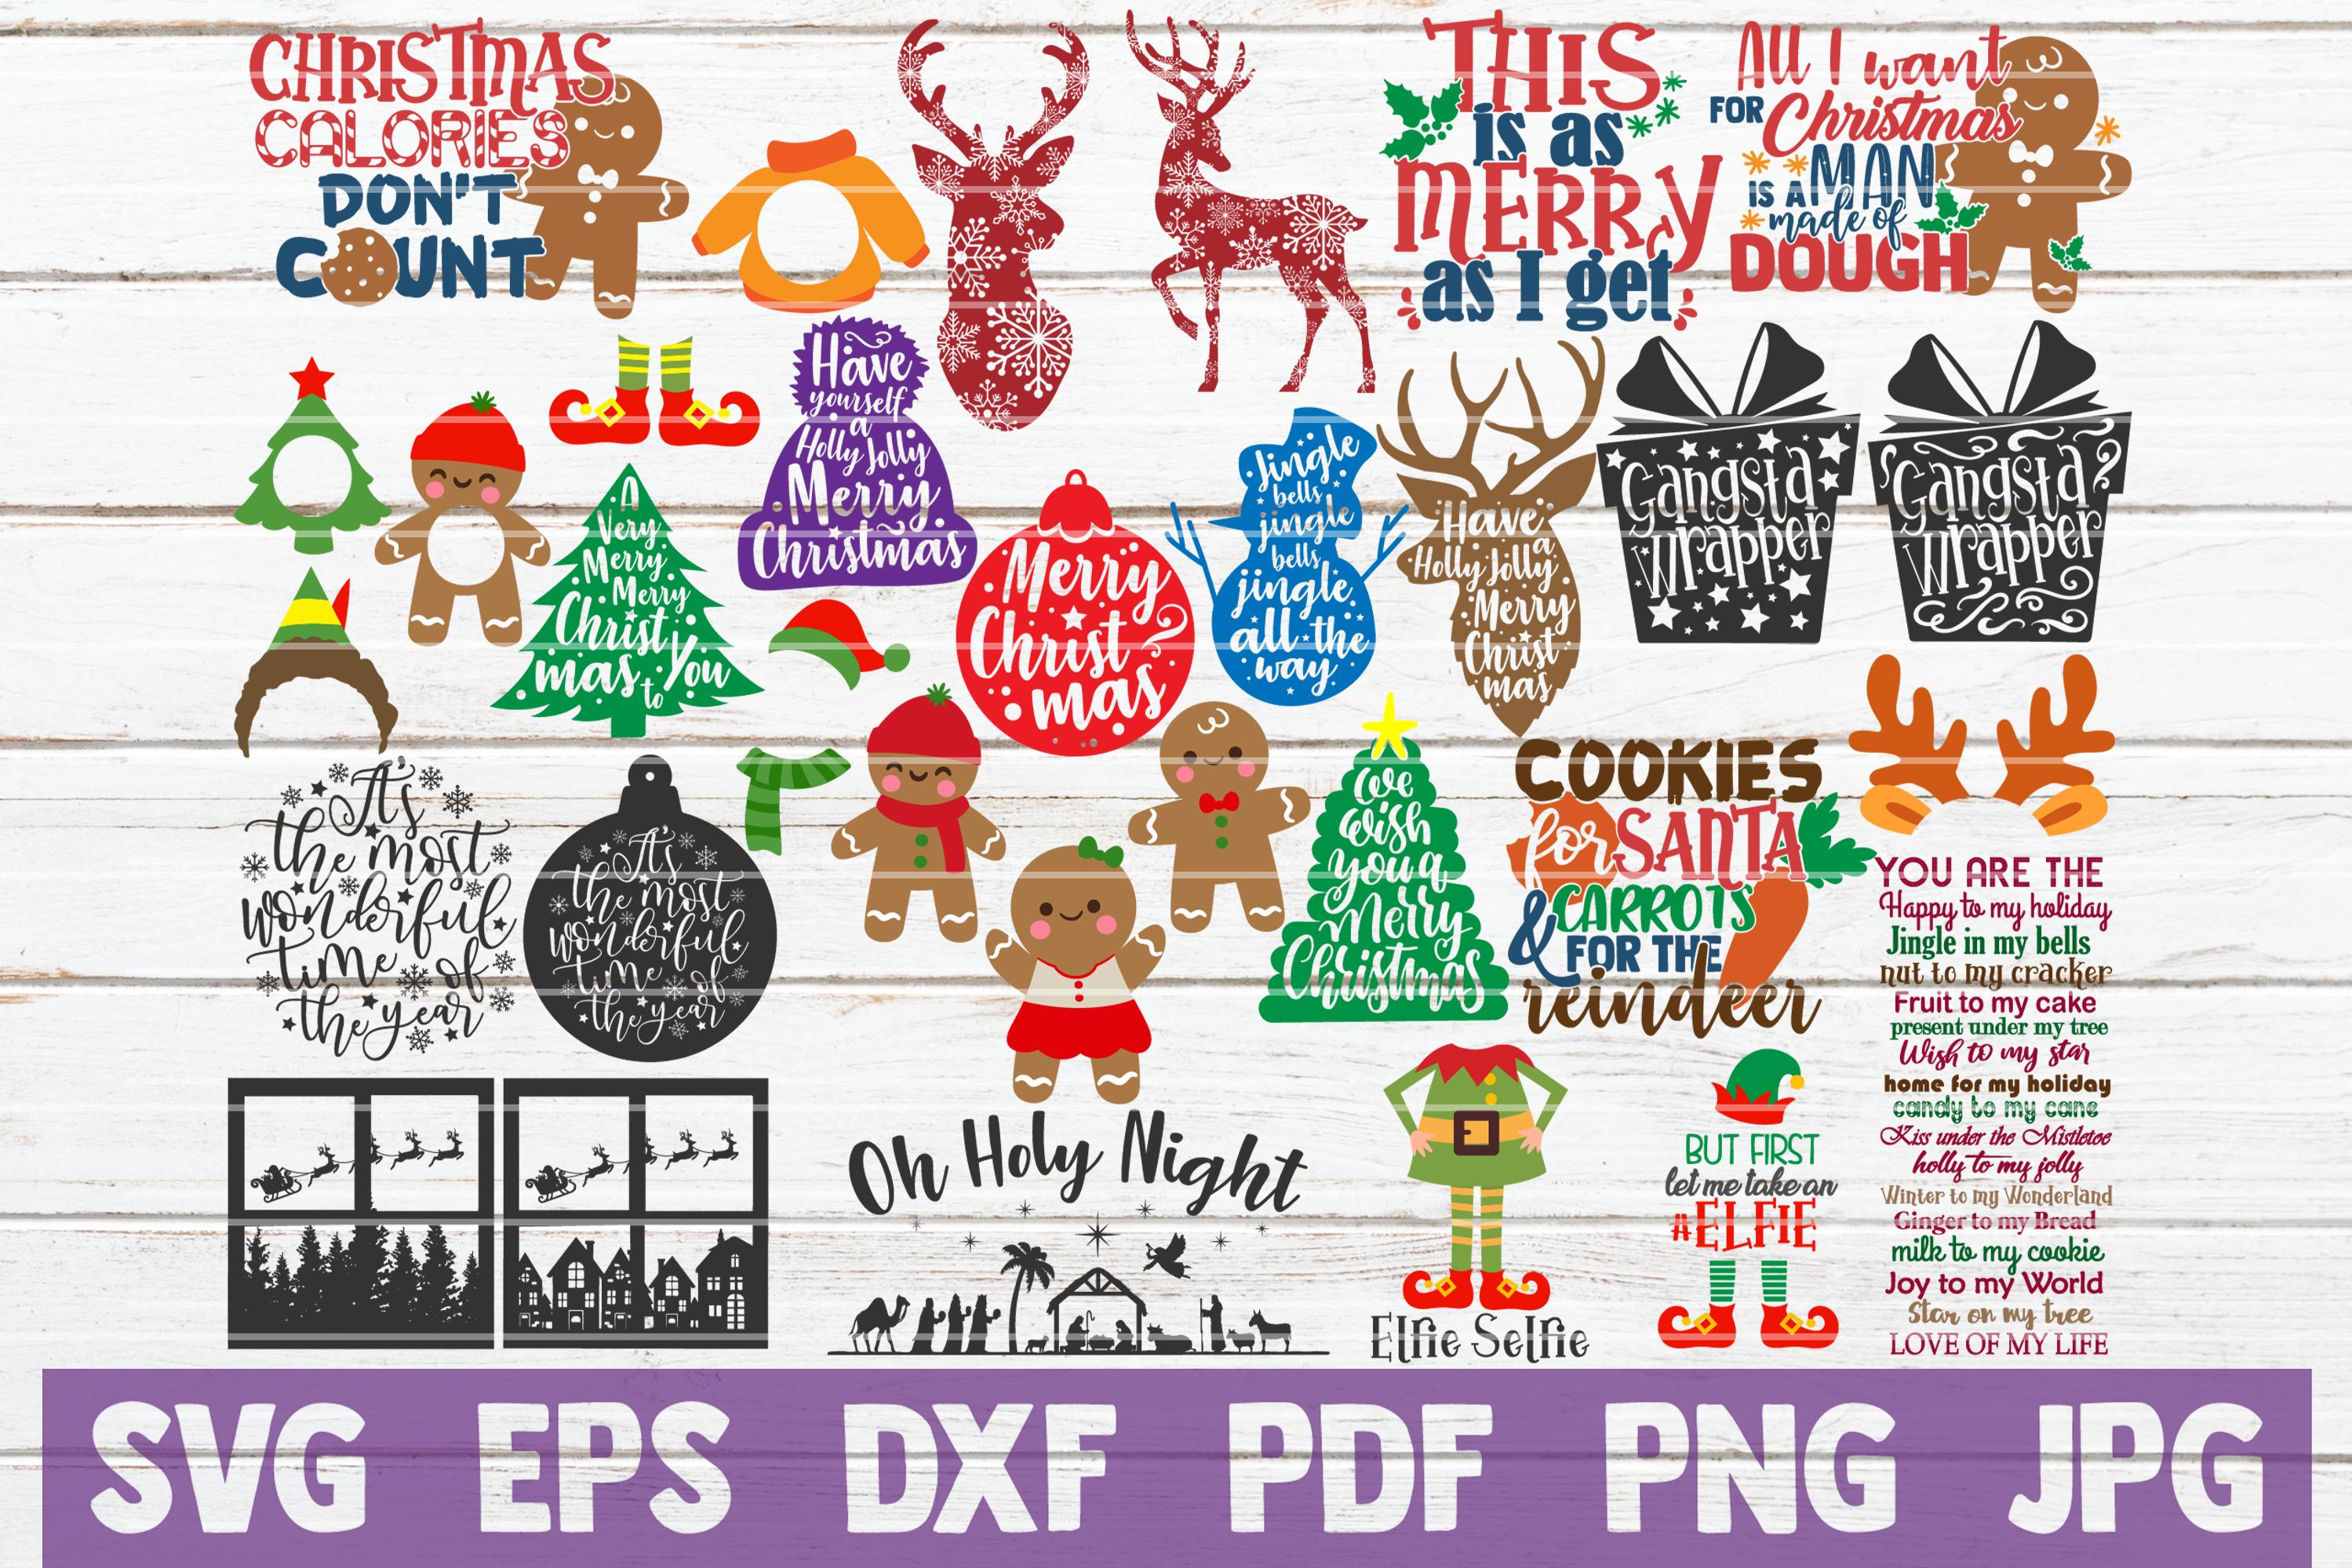 HUGE Christmas SVG Bundle |100 Holiday Designs SVG Cut Files example image 3